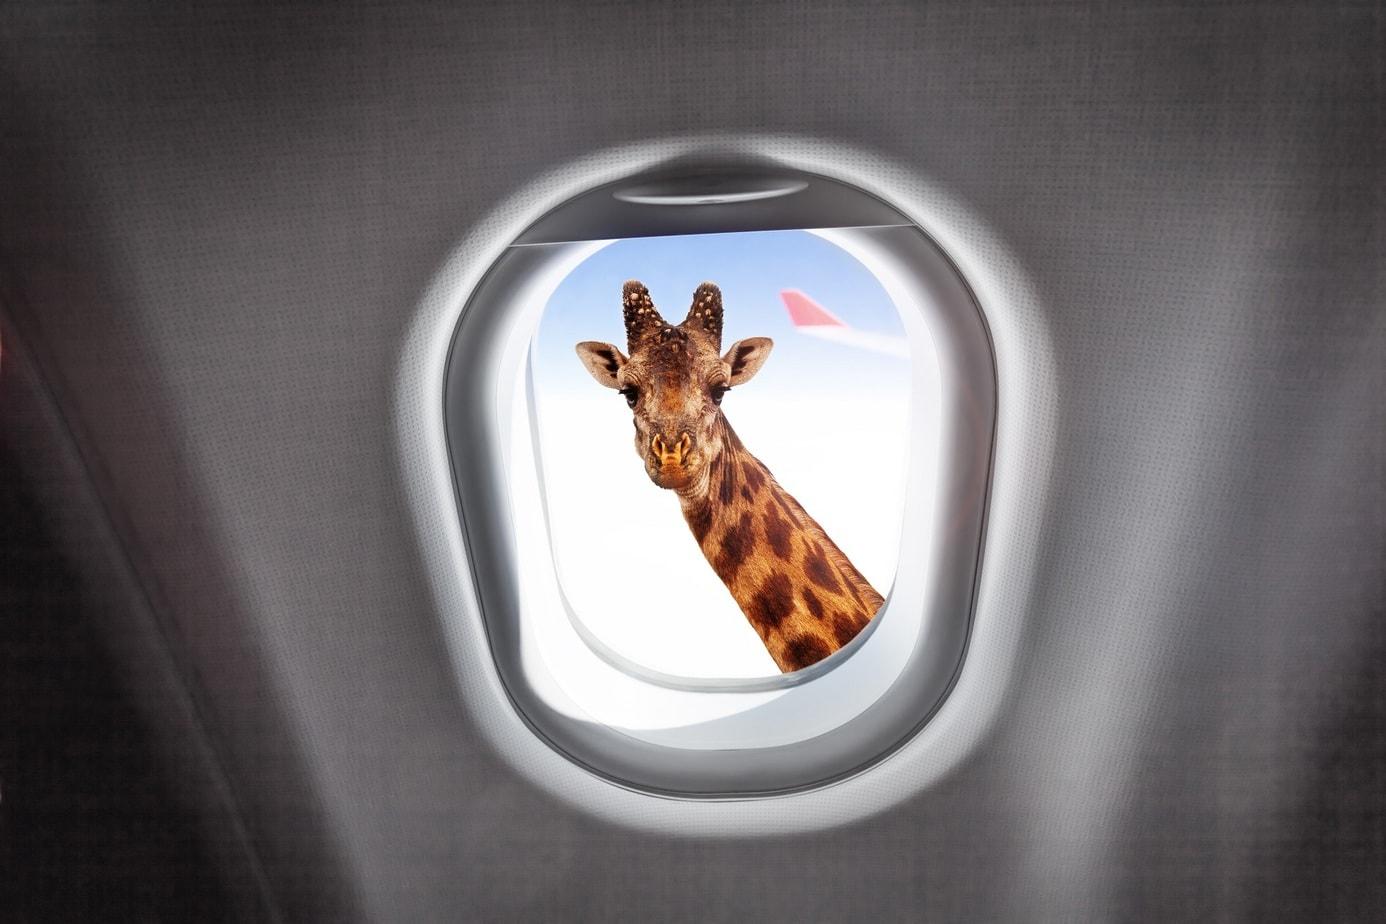 Giraffe looking through a plane's window